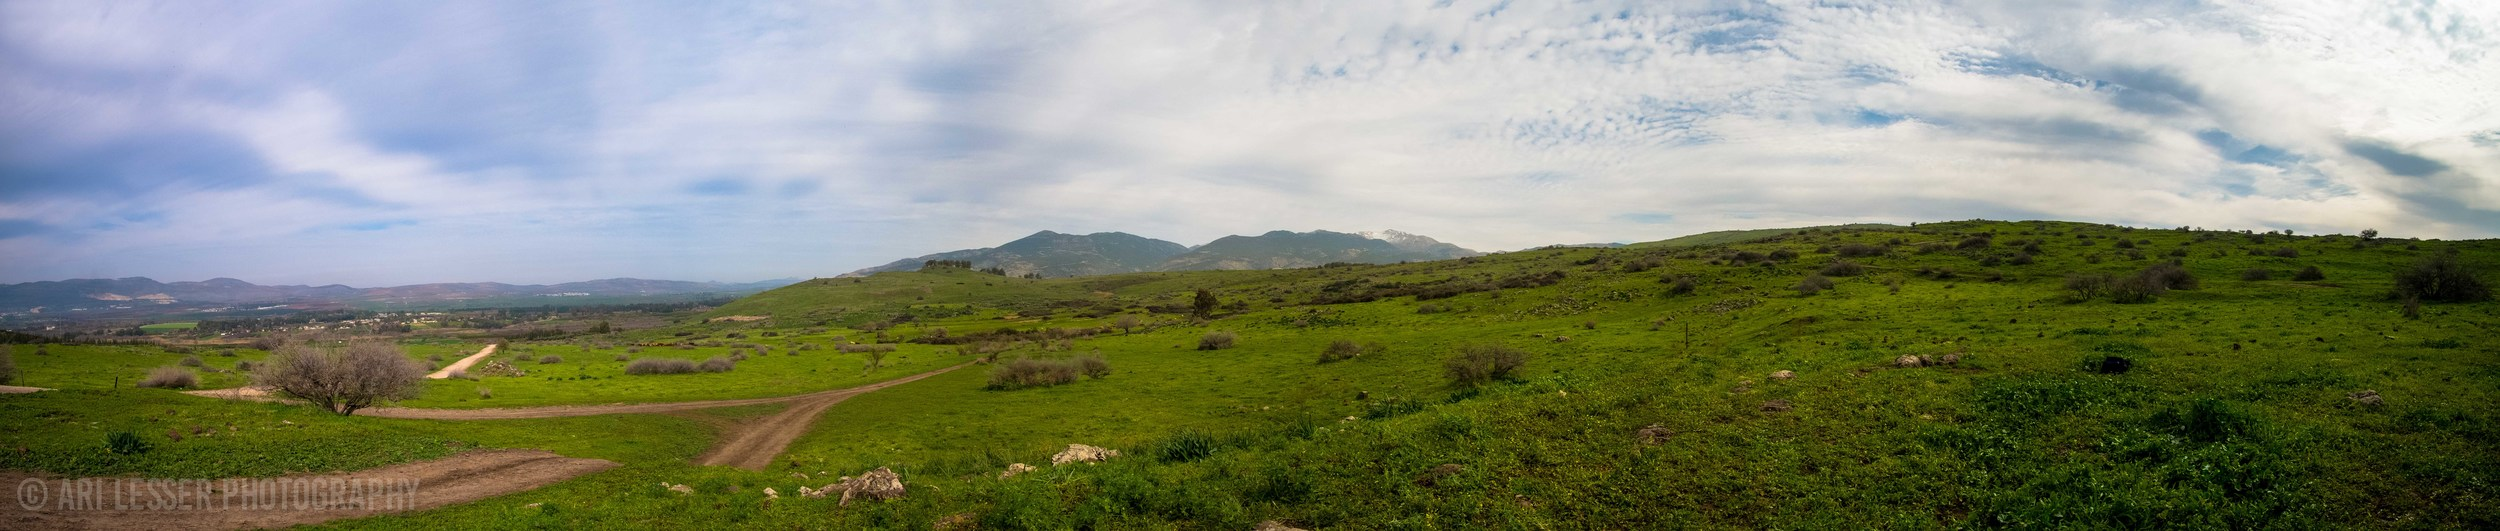 Panoramic shot of the Golan Heights